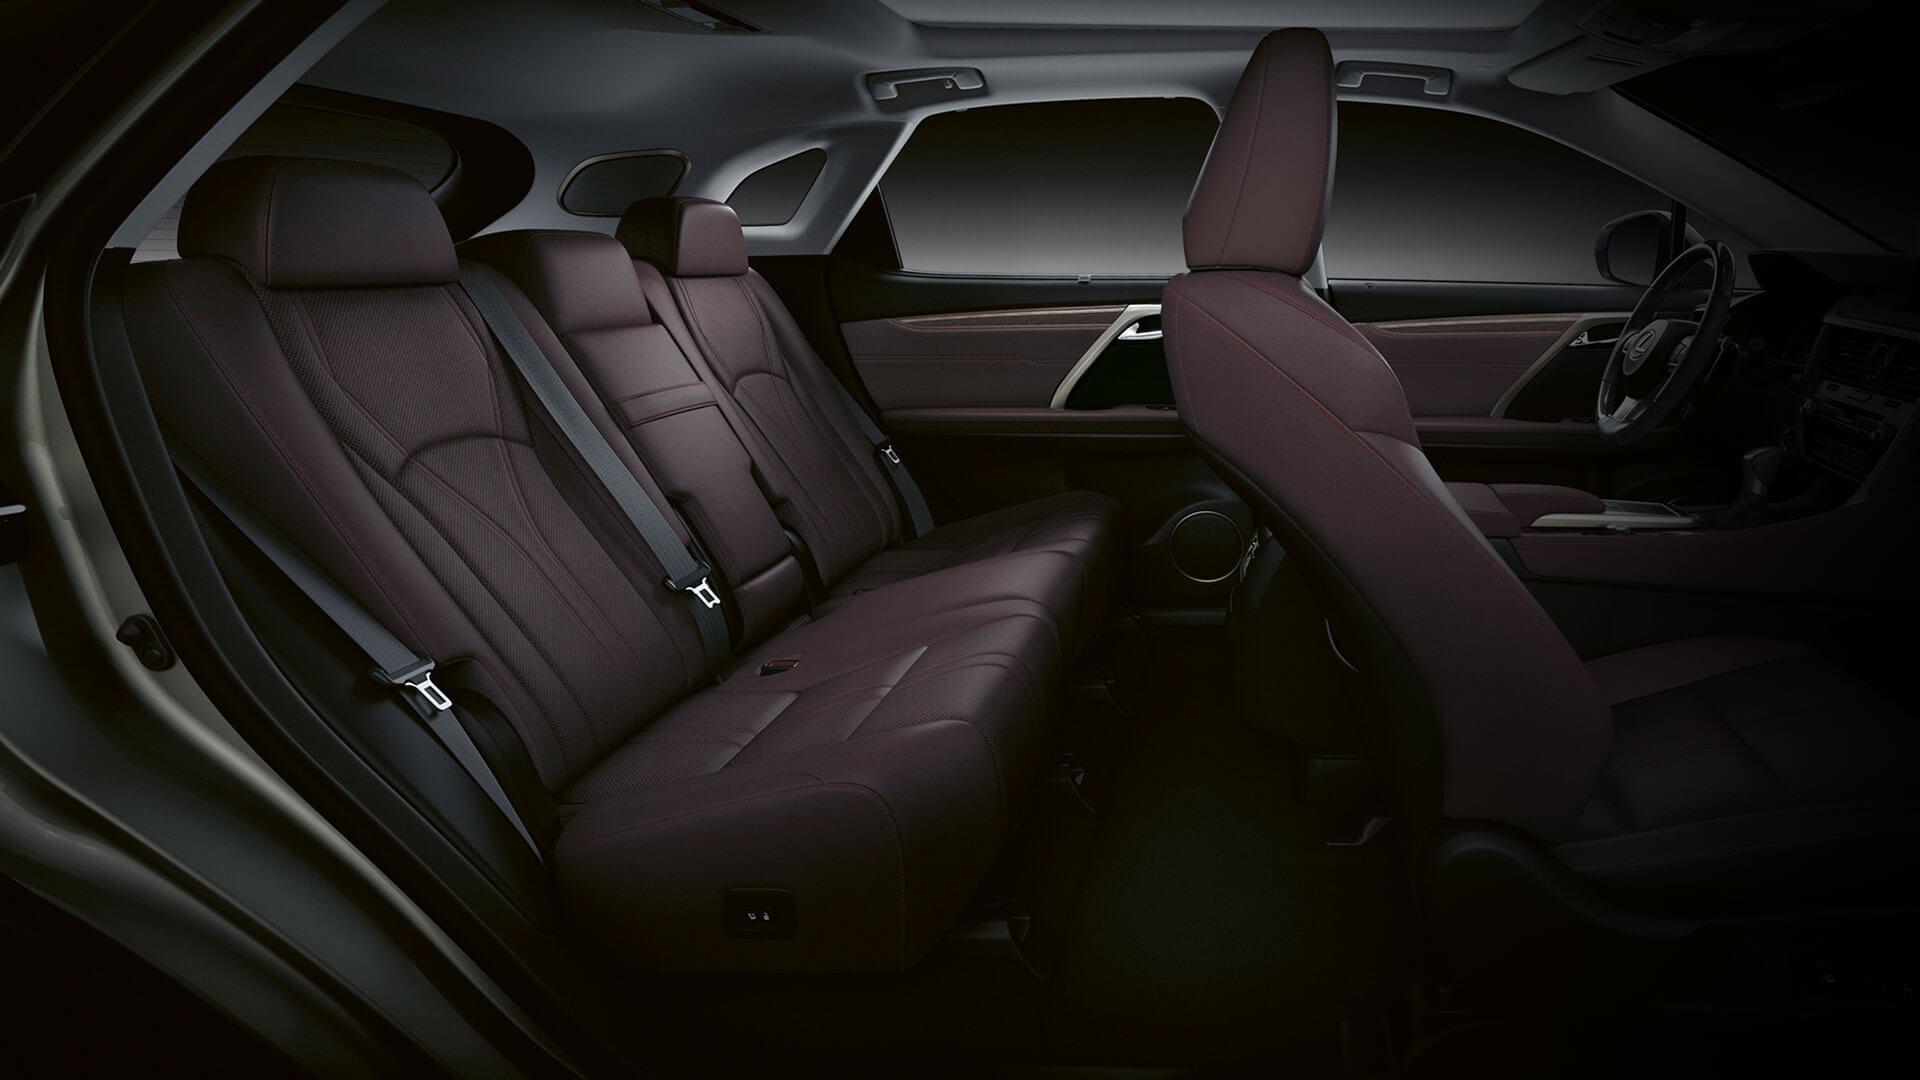 2019 lexus rx hotspot interior heated leather rear seats